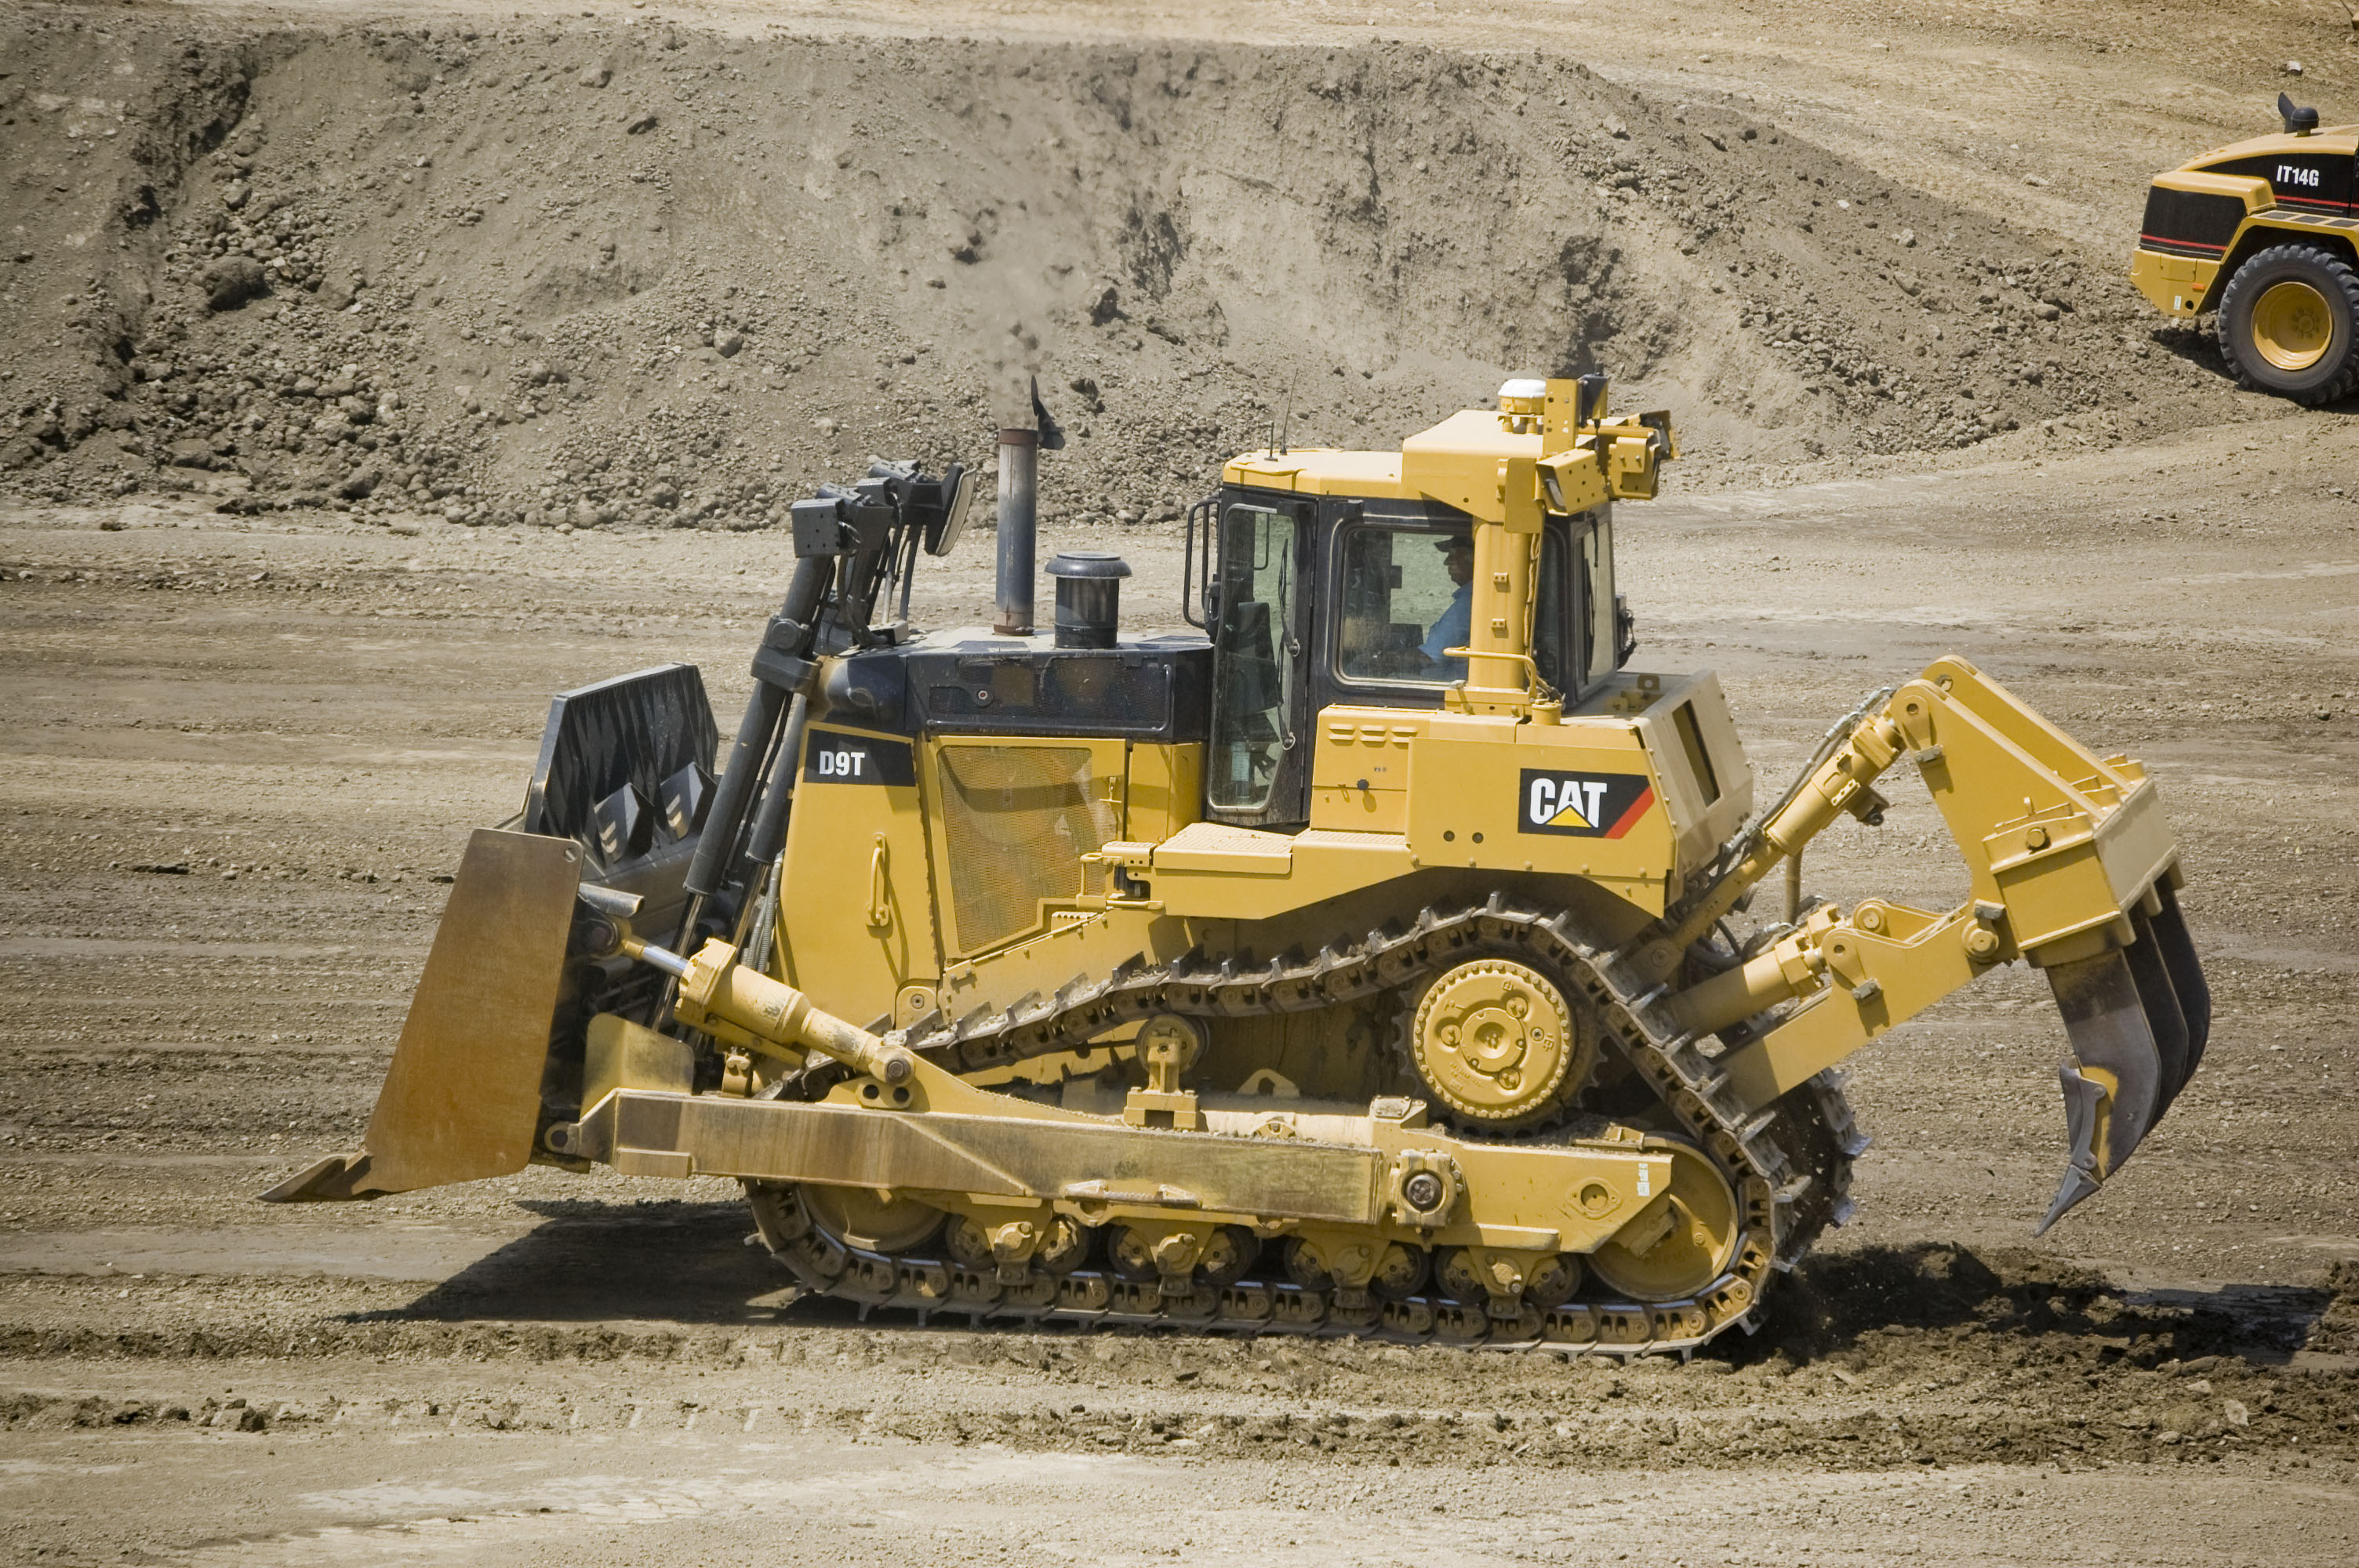 role heavy bulldozer propulsion caterpillar tracks engine model cat